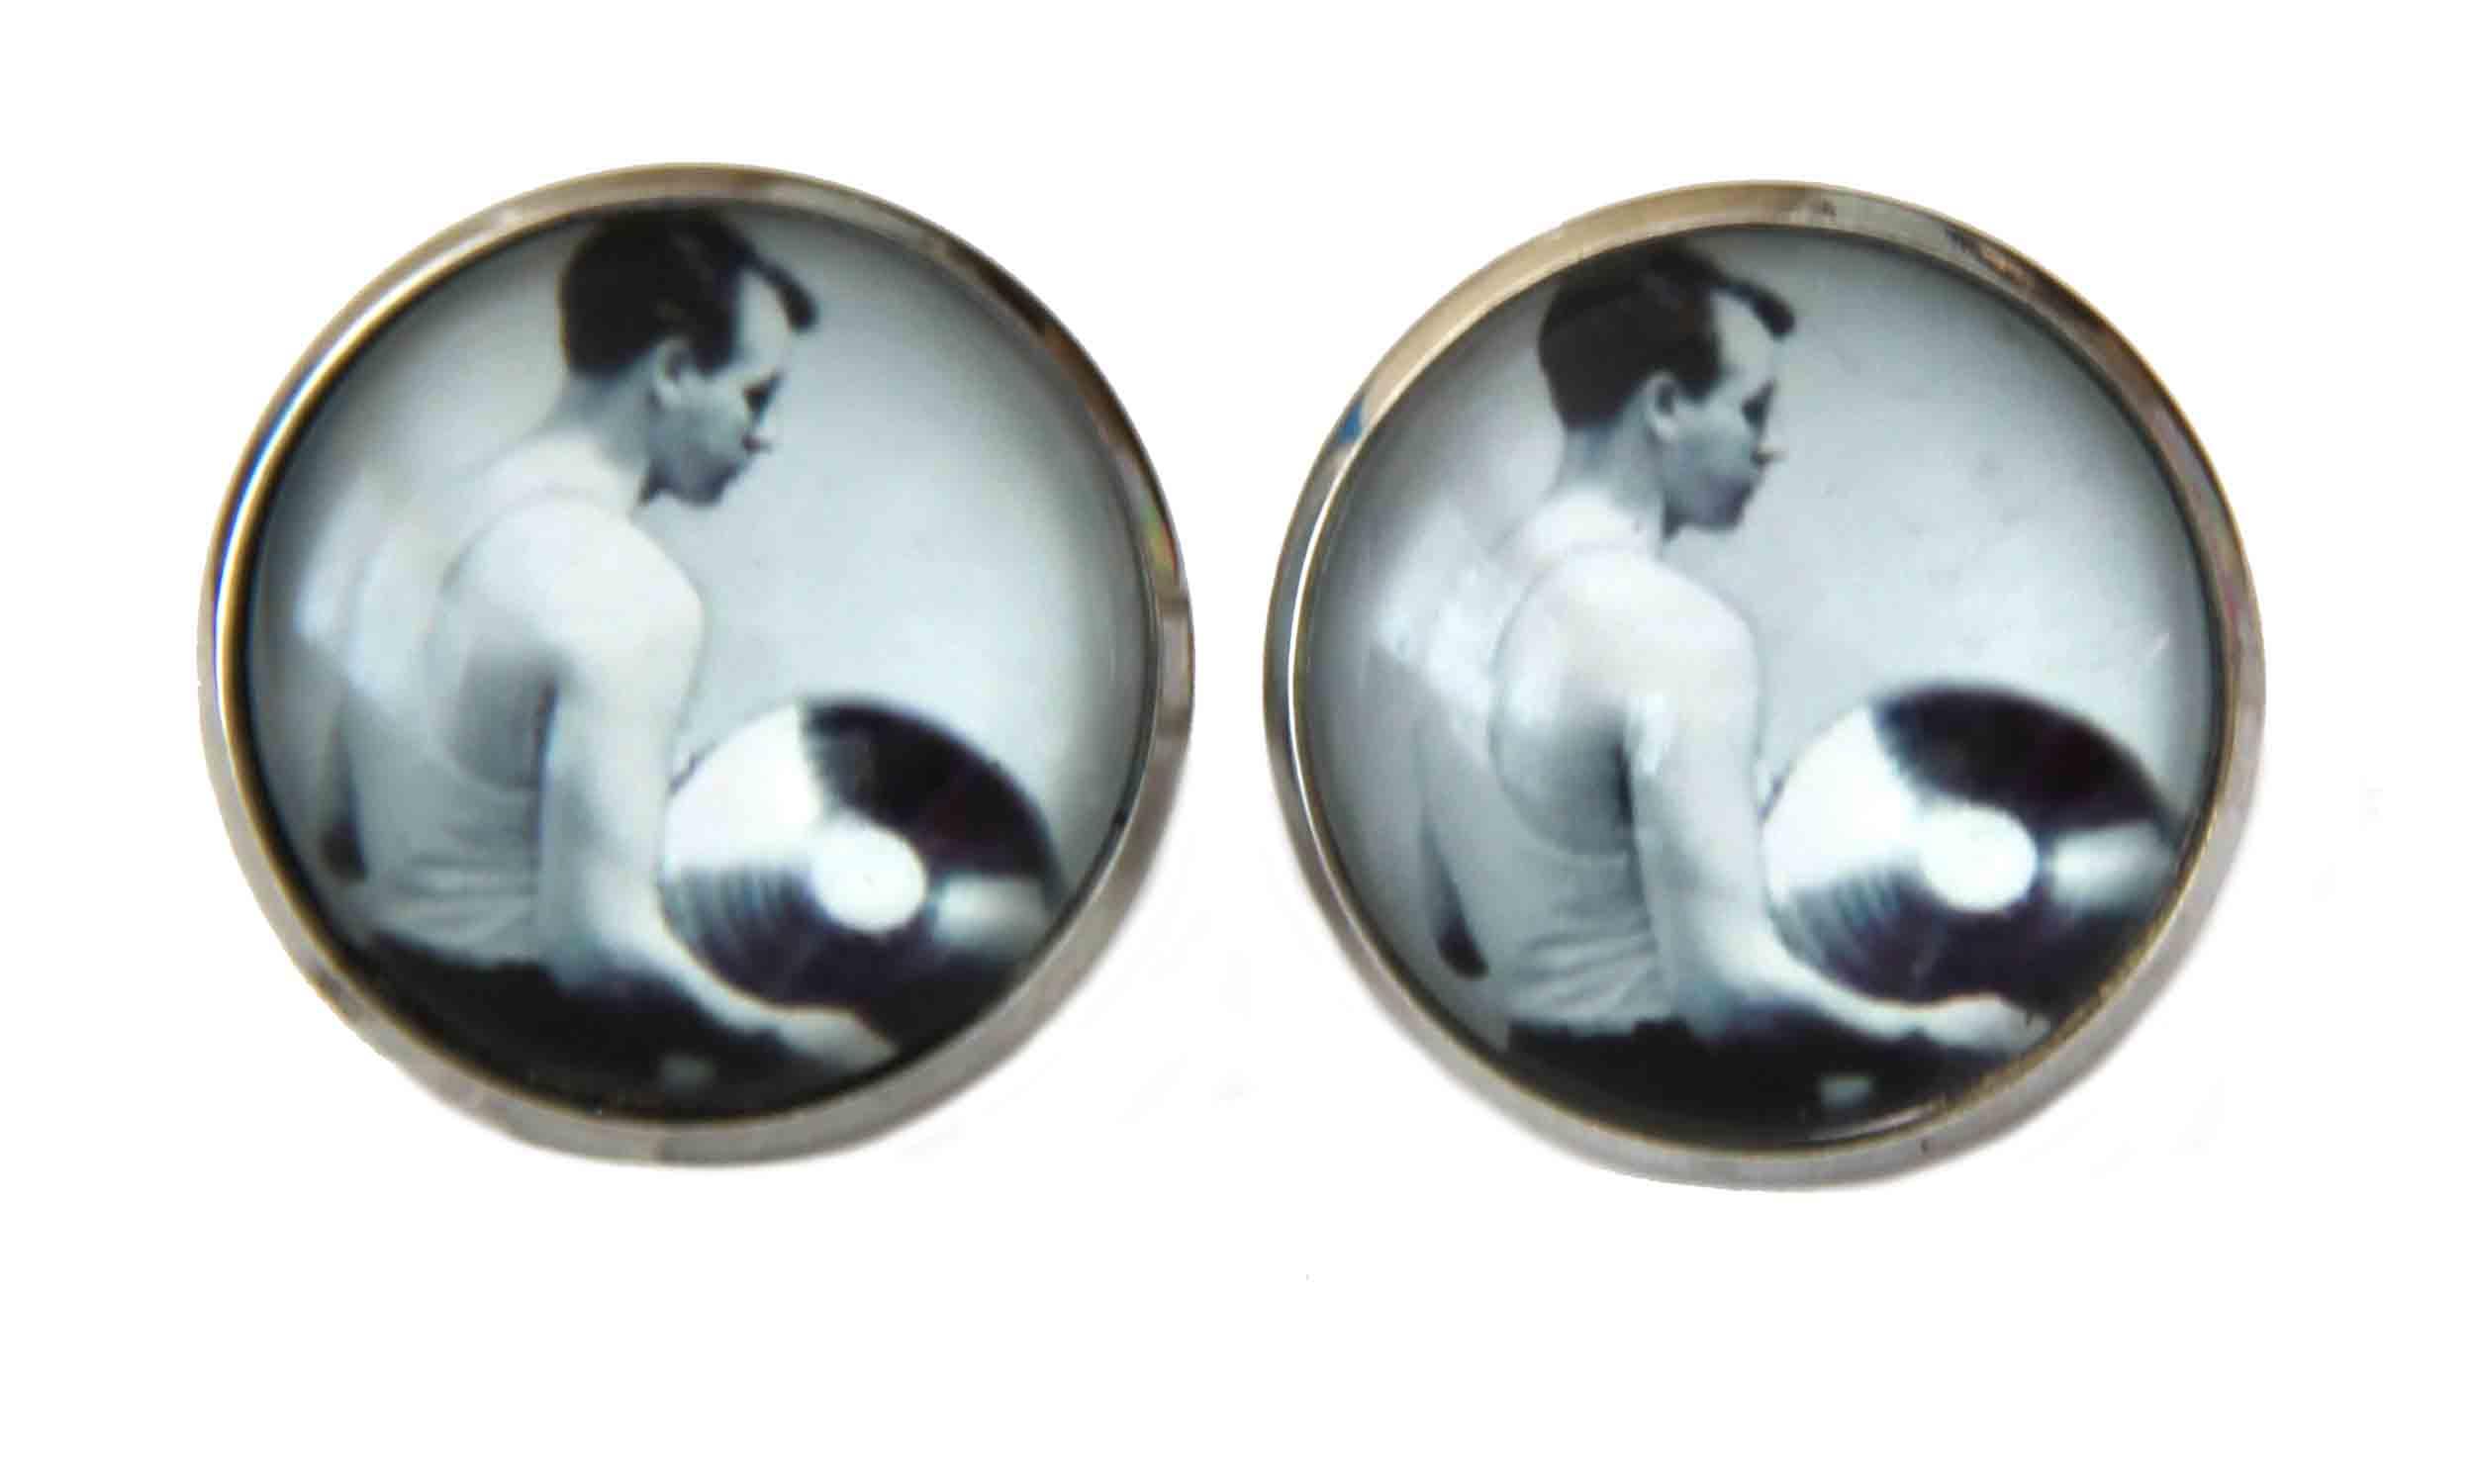 Gascoigne Cufflinks Repro Vintage Vinyl Records  Pattern Silver Black Gray Men'slack